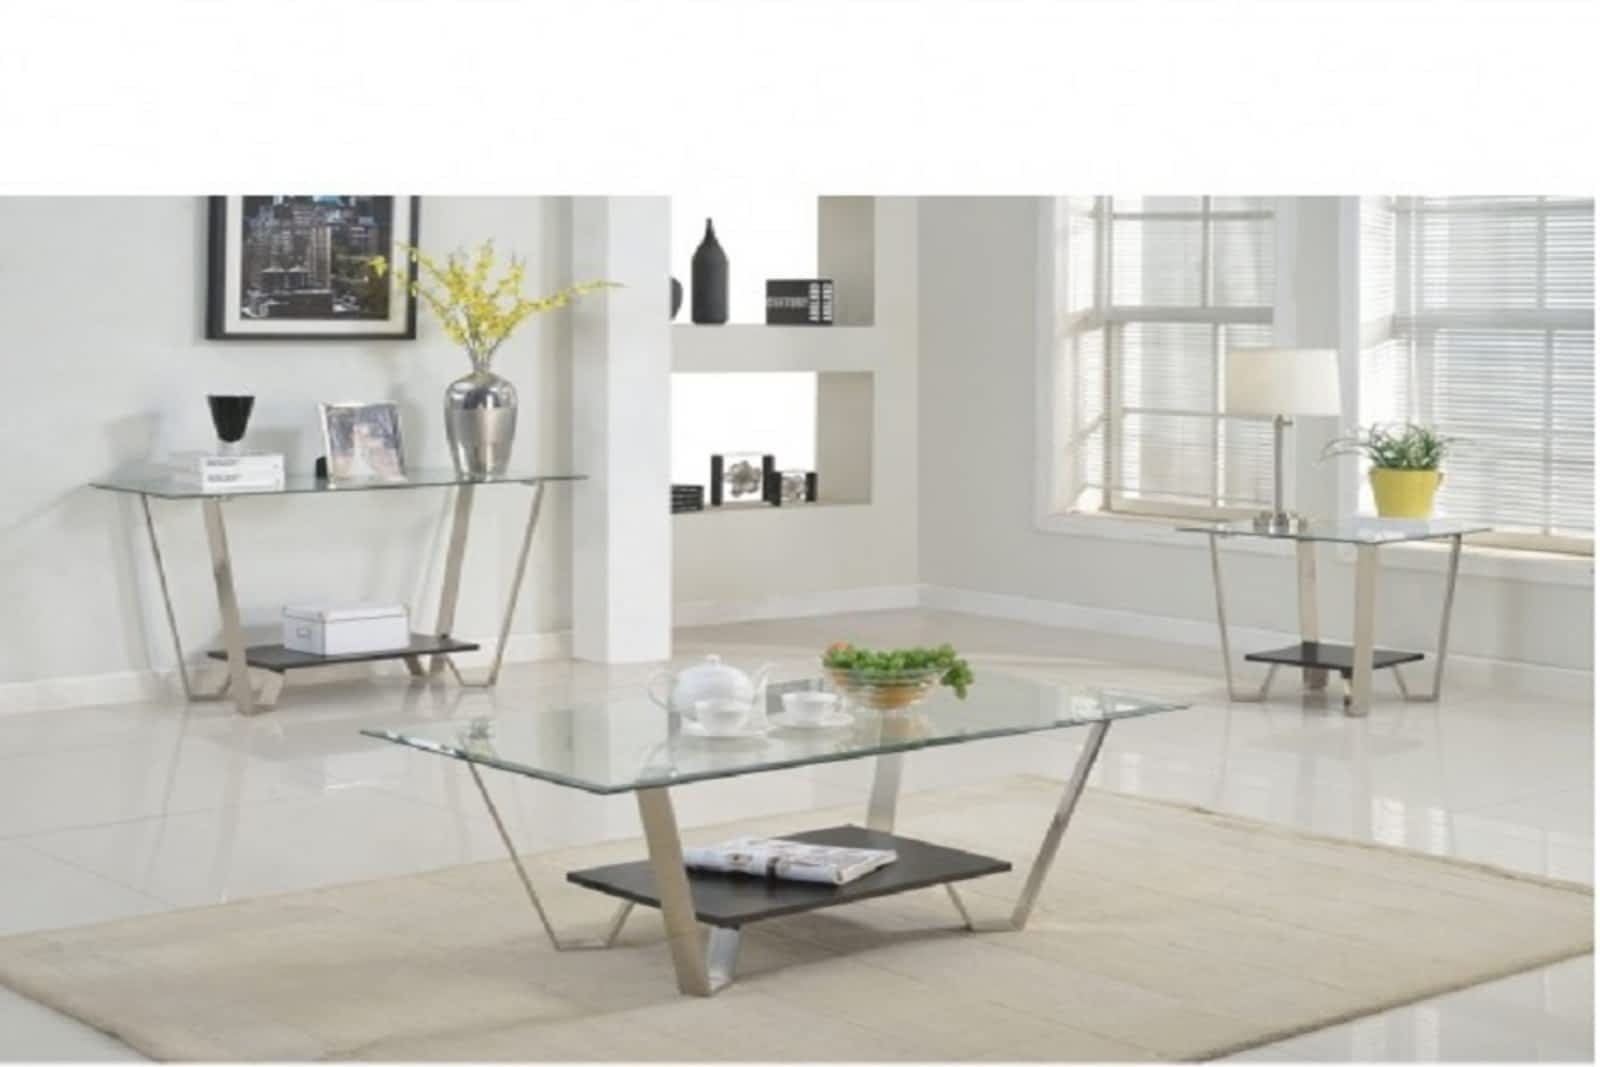 Arv furniture opening hours 5925 tomken road mississauga on